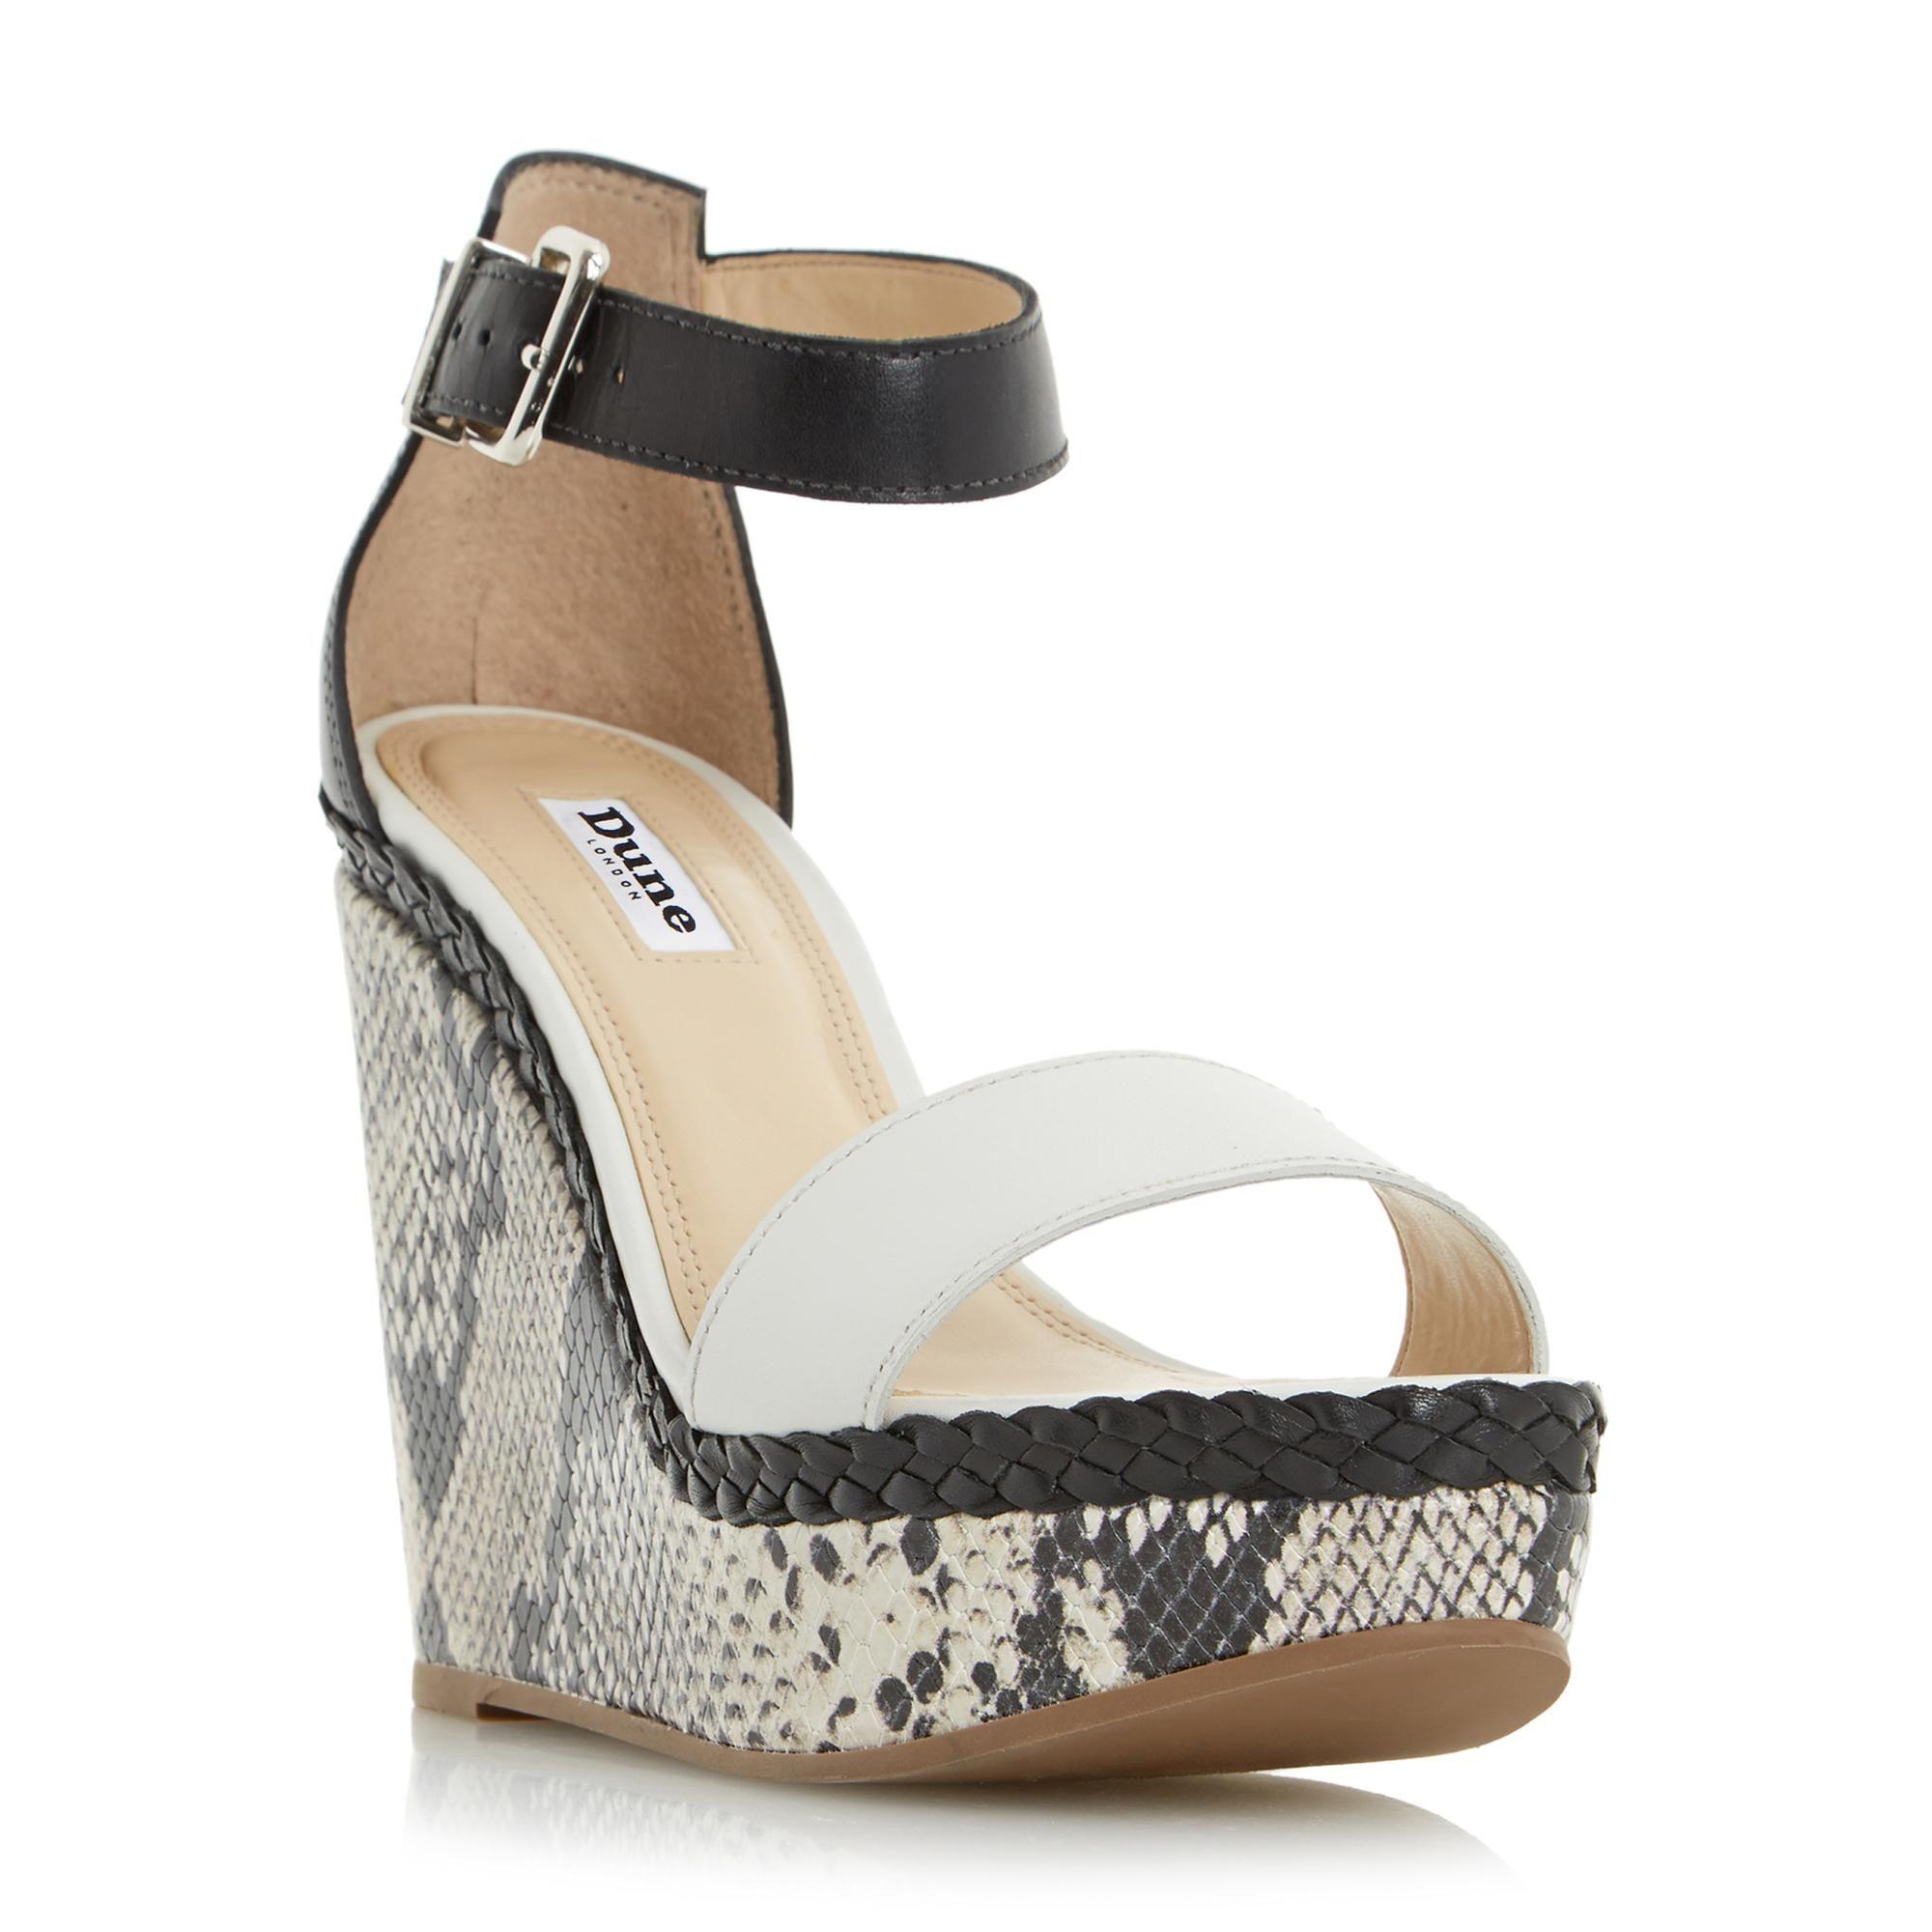 DUNE LADIES KANDY - Reptile Print Wedge Sandal - black   Dune Shoes Online